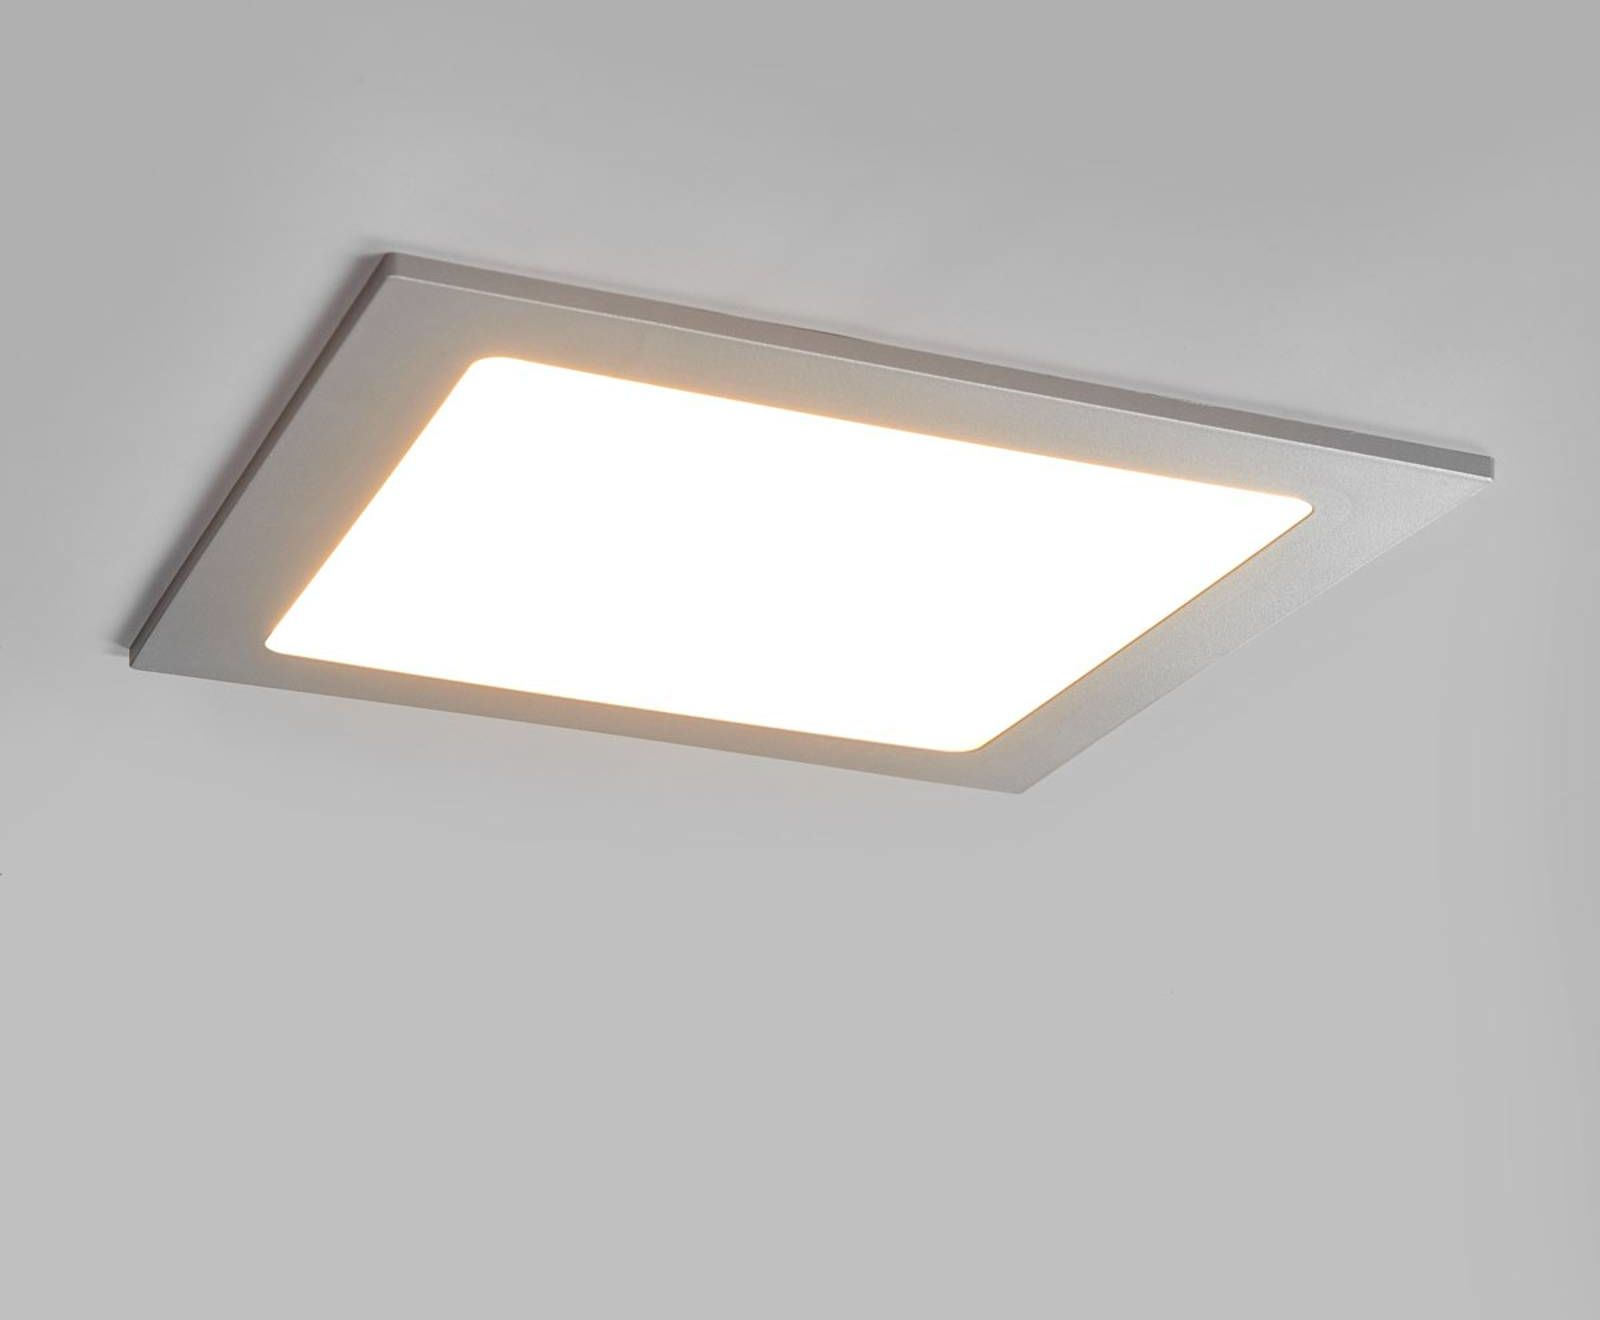 Spot LED Joki srebrny 3 000 K kątowy 22cm